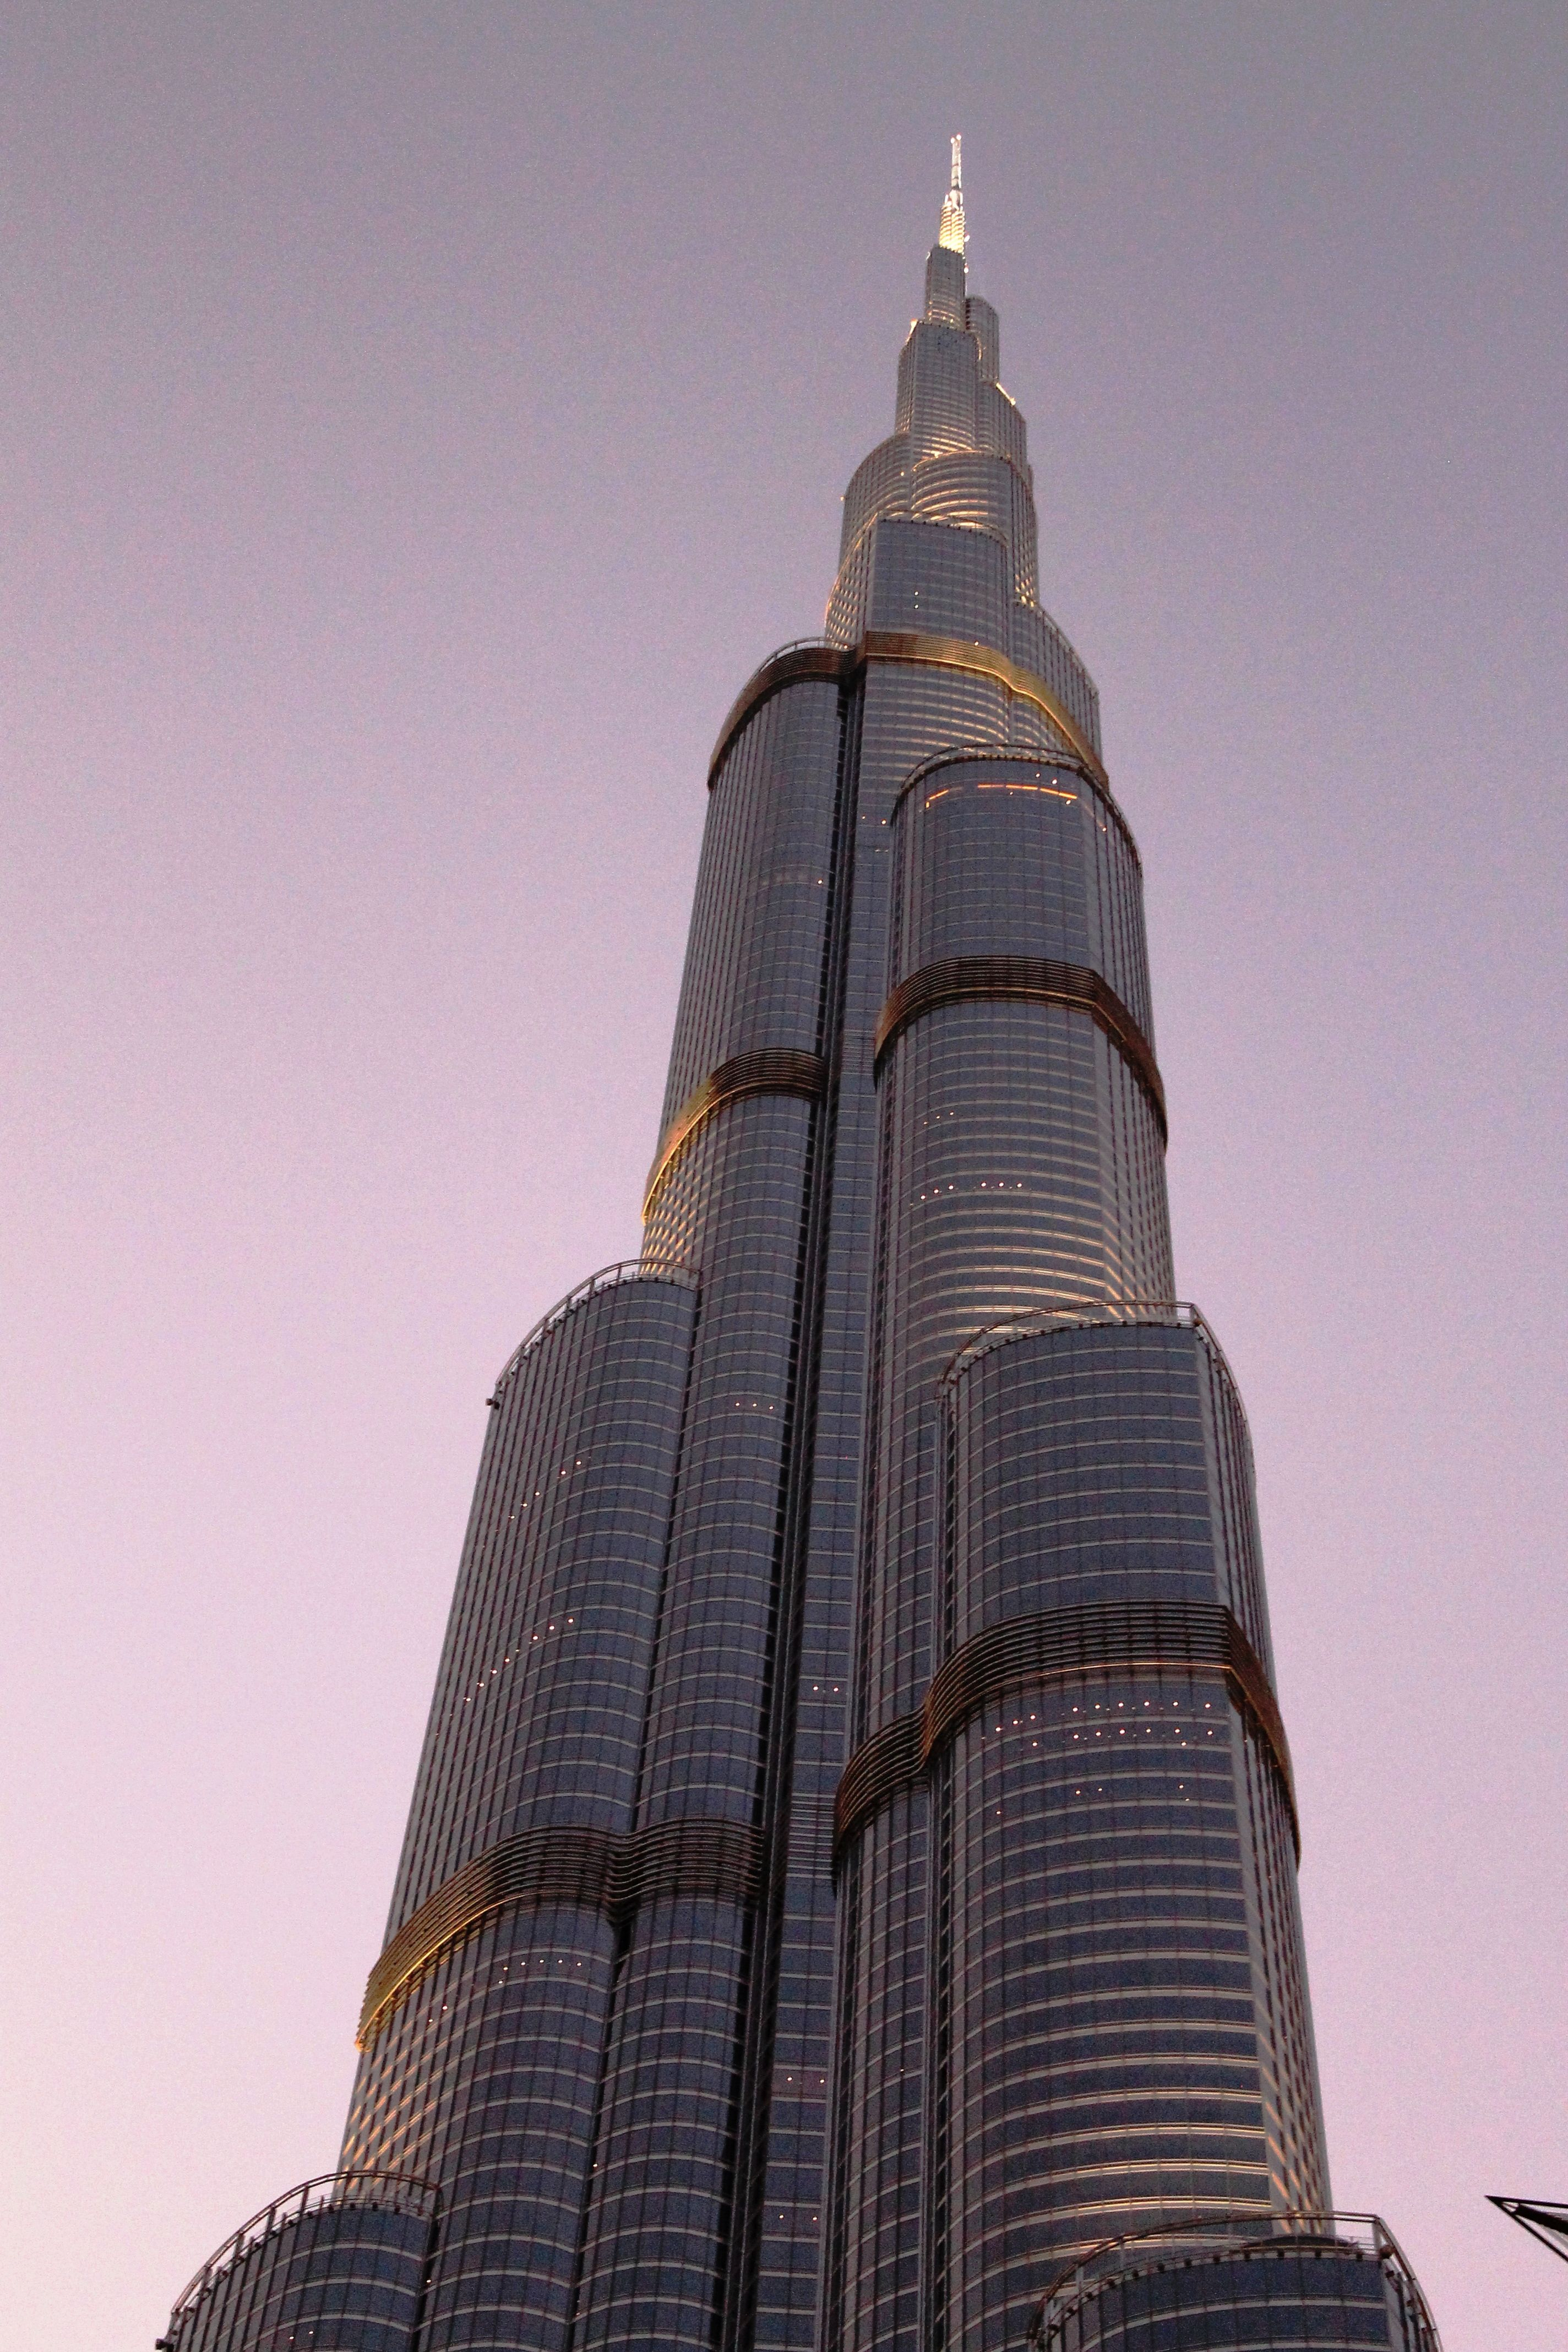 Burj Khalifa Arabic برج خليفة Khalifa Tower Is A Skyscraper In Dubai United Arab Emirates And Is The Tallest Manmade Stru Burj Khalifa Tower Skyscraper